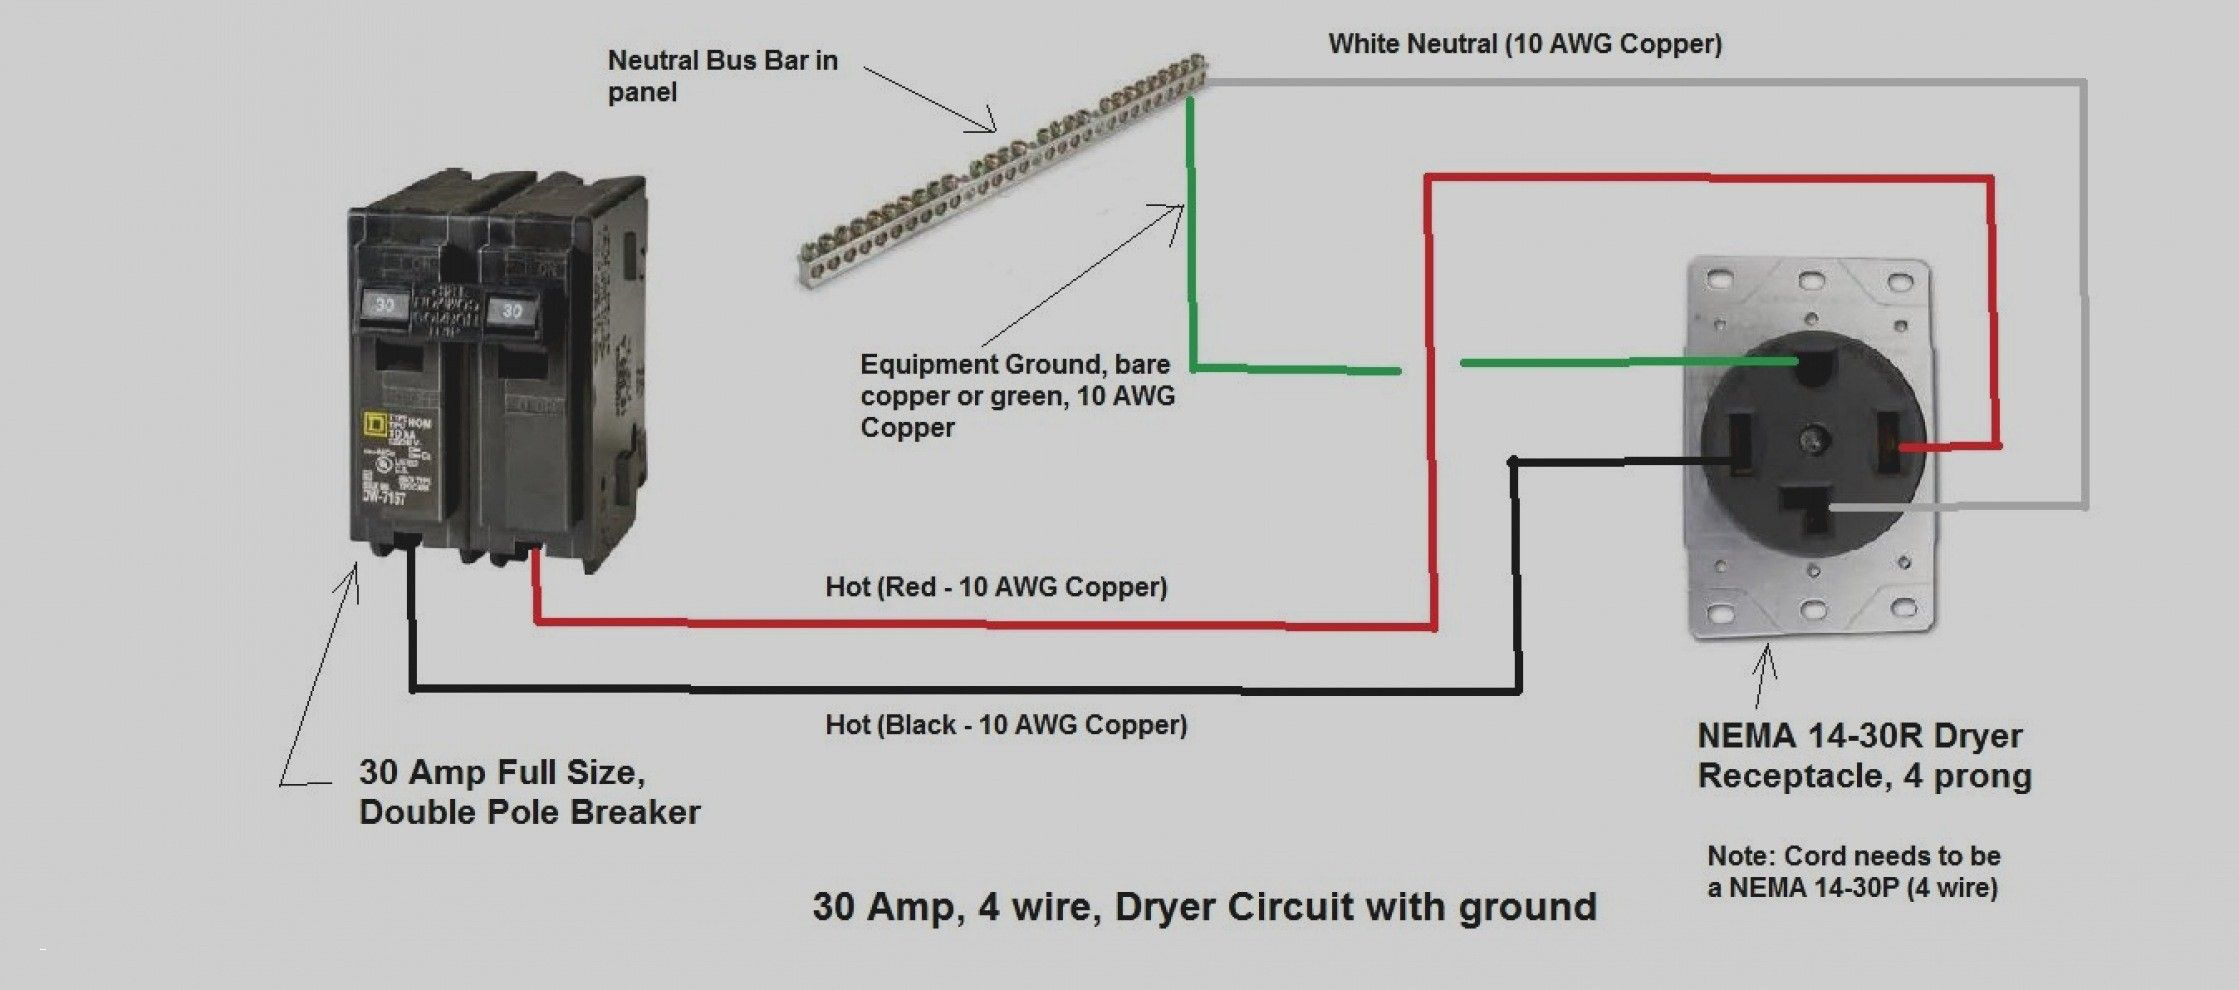 New Mercedes Glow Plug Relay Wiring Diagram Dryer Plug Dryer Outlet Electrical Wiring Diagram